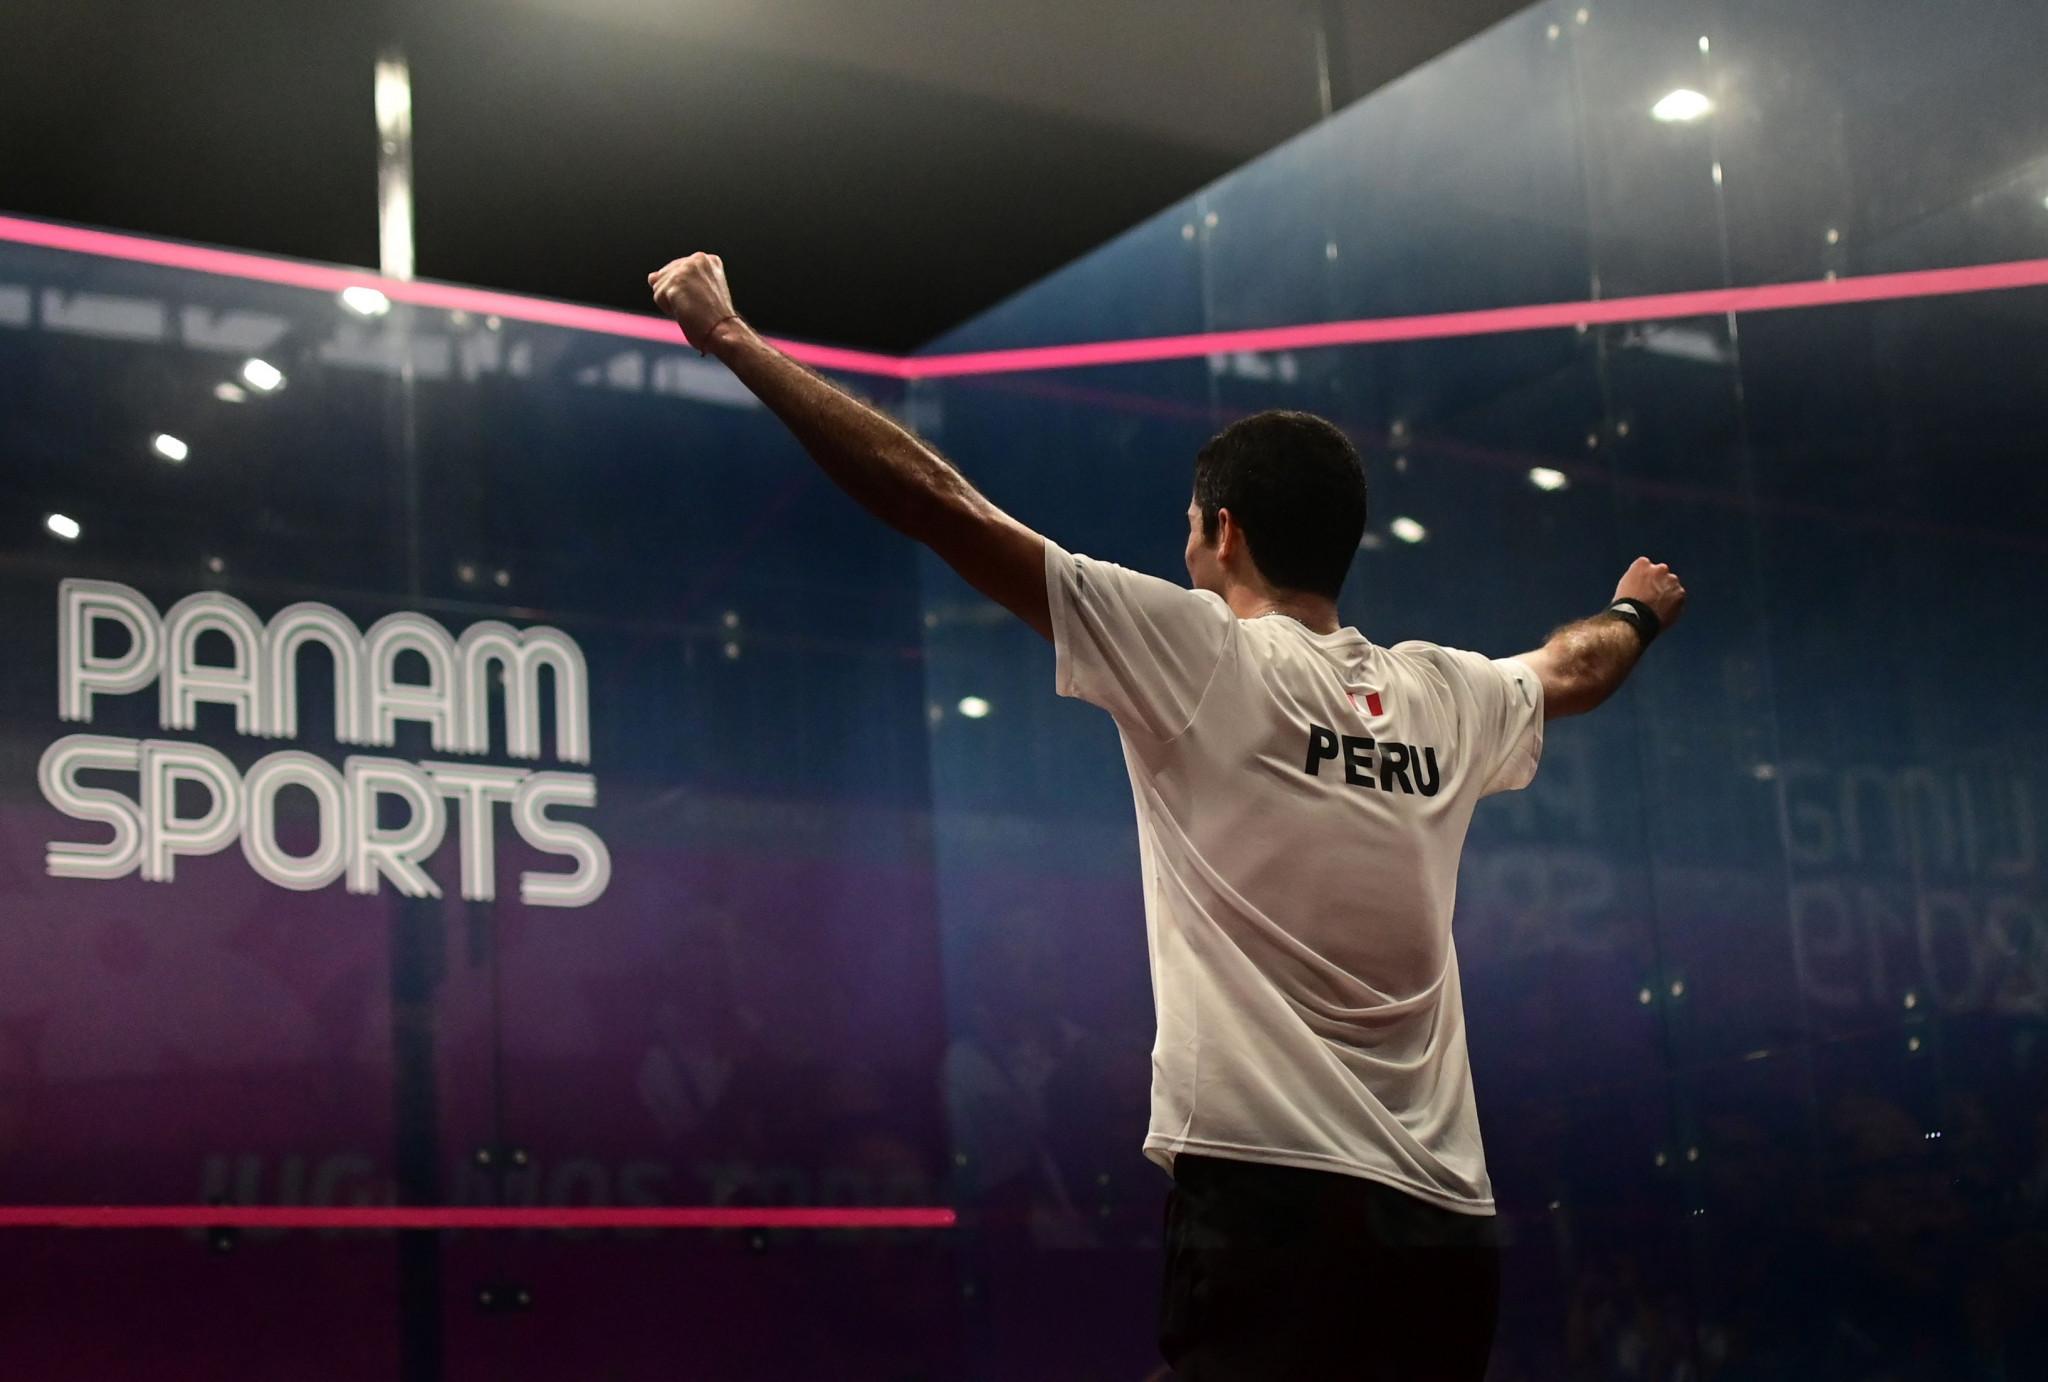 Elías secures revenge to triumph in men's squash competition at Lima 2019